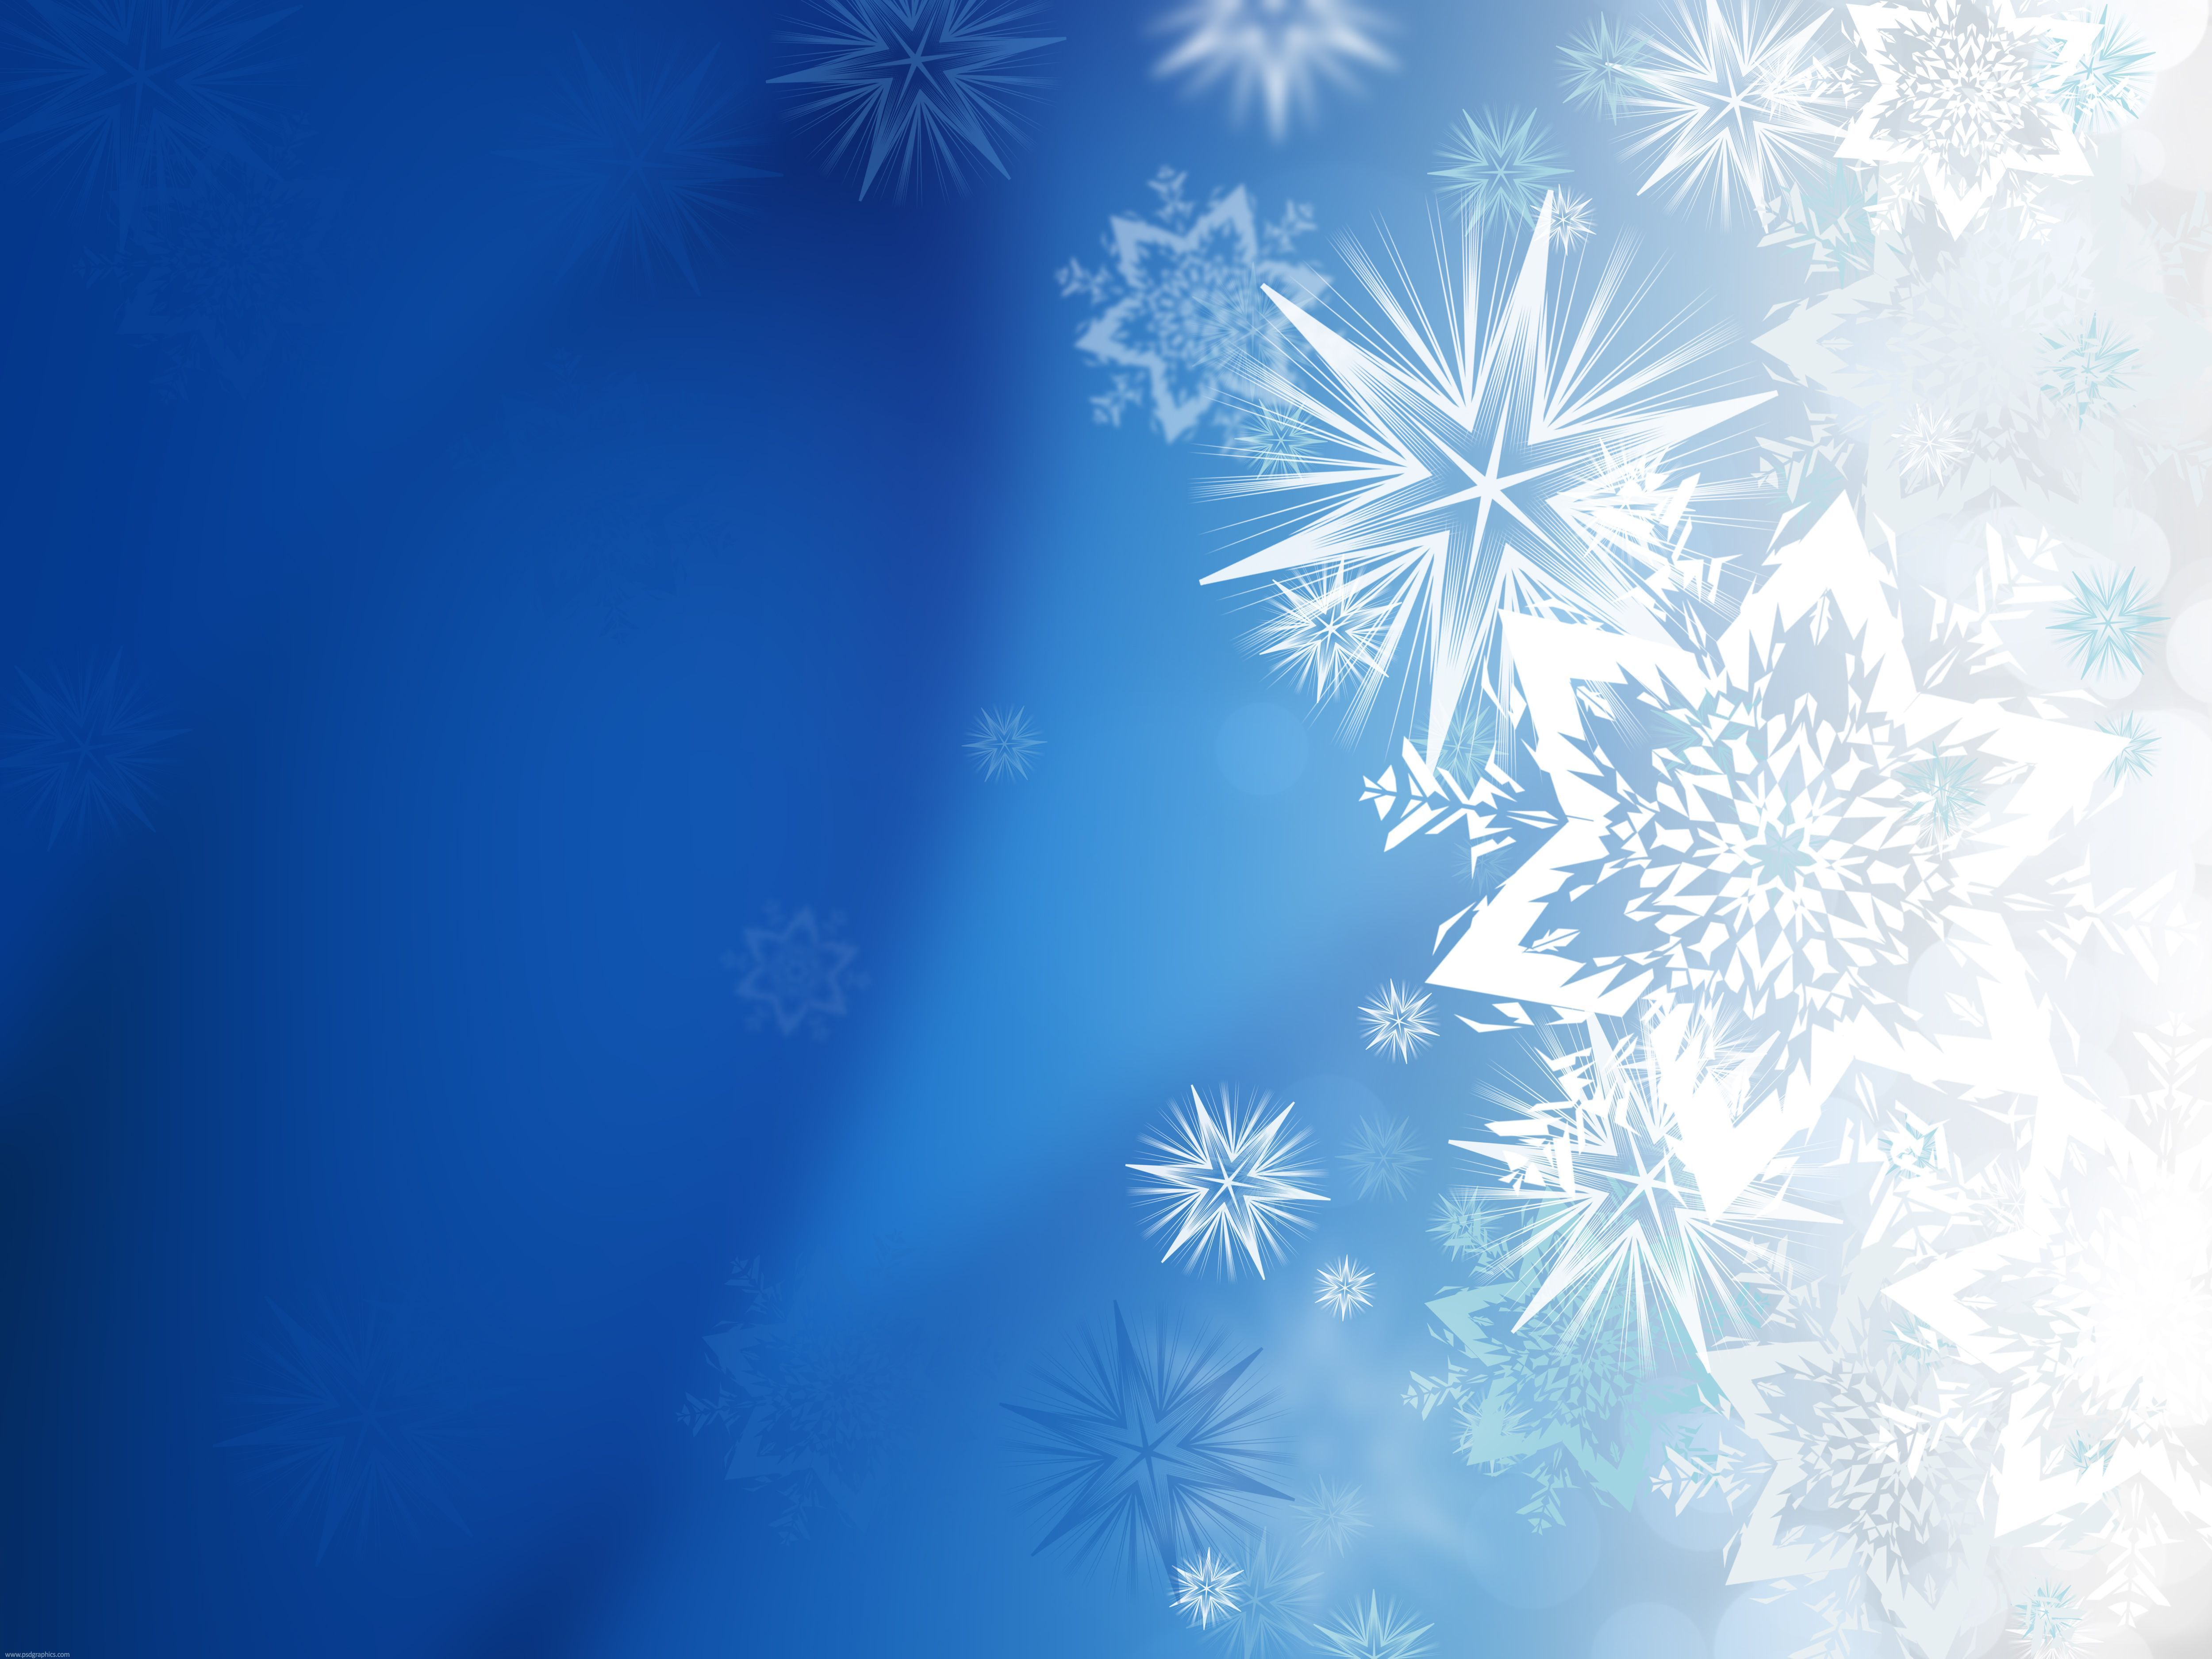 Winter Backgrounds Wallpaper